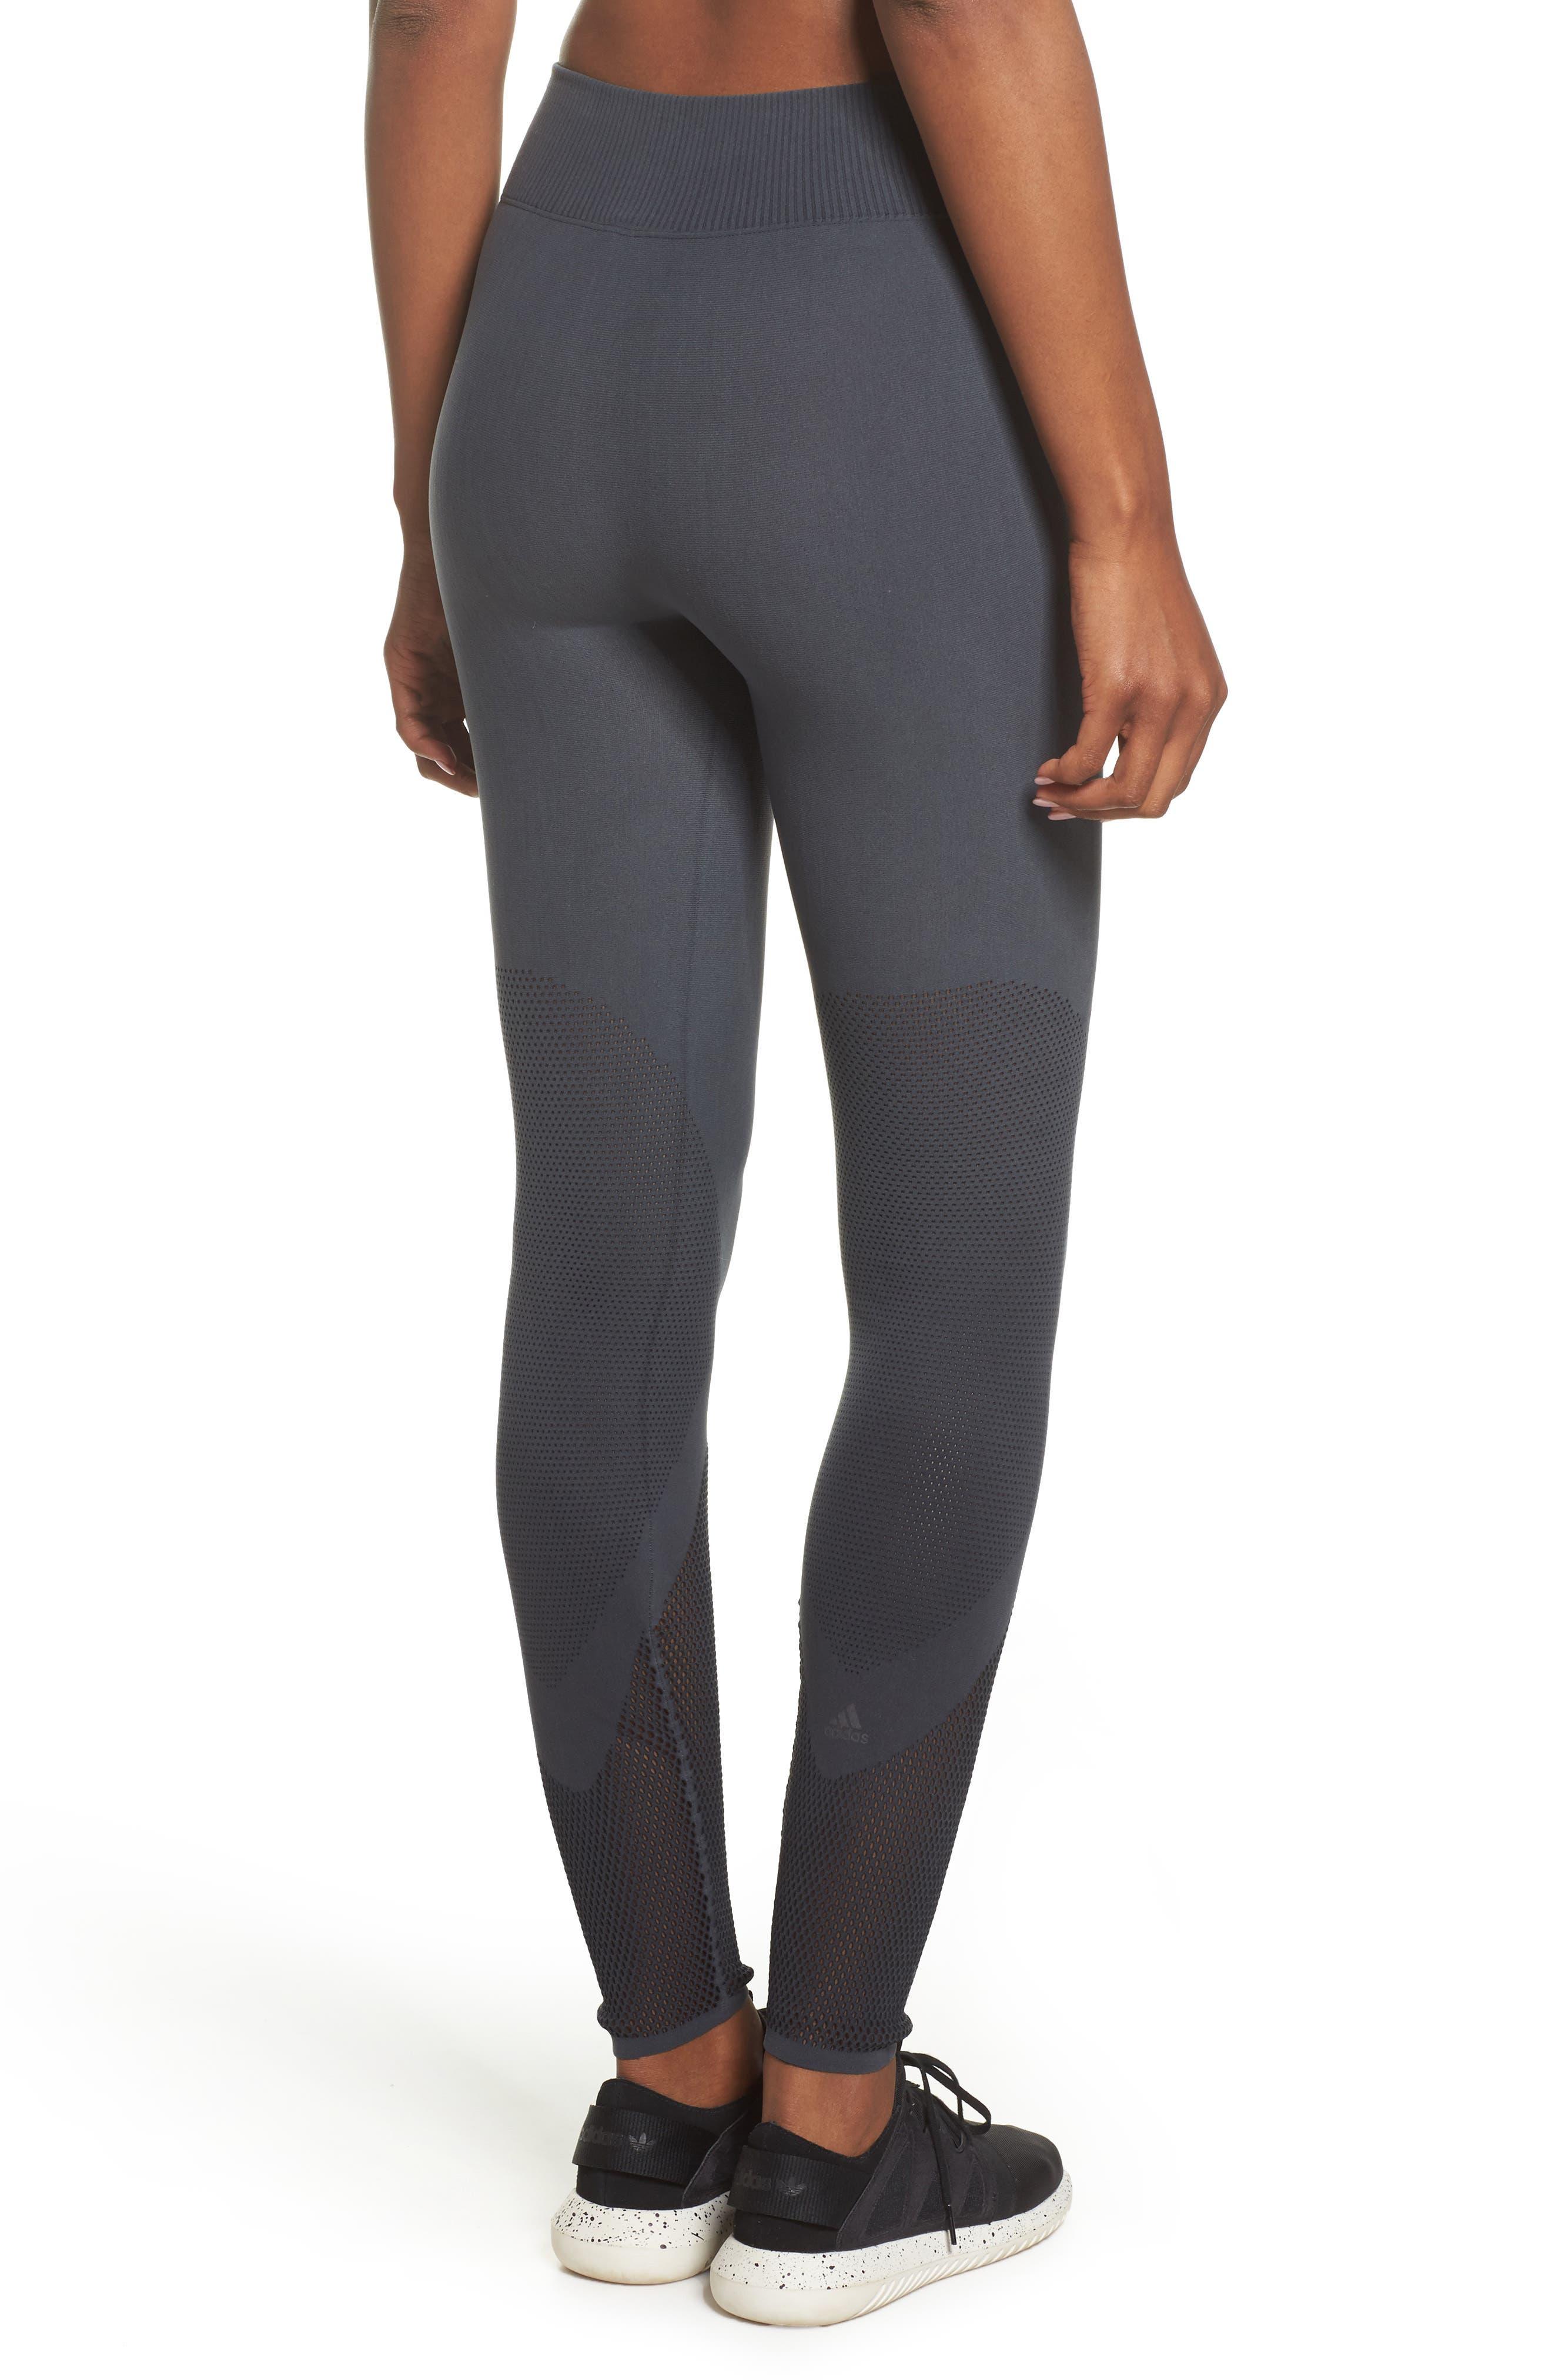 Warp Climacool<sup>®</sup> Knit Tights,                             Alternate thumbnail 2, color,                             Carbon/ Black